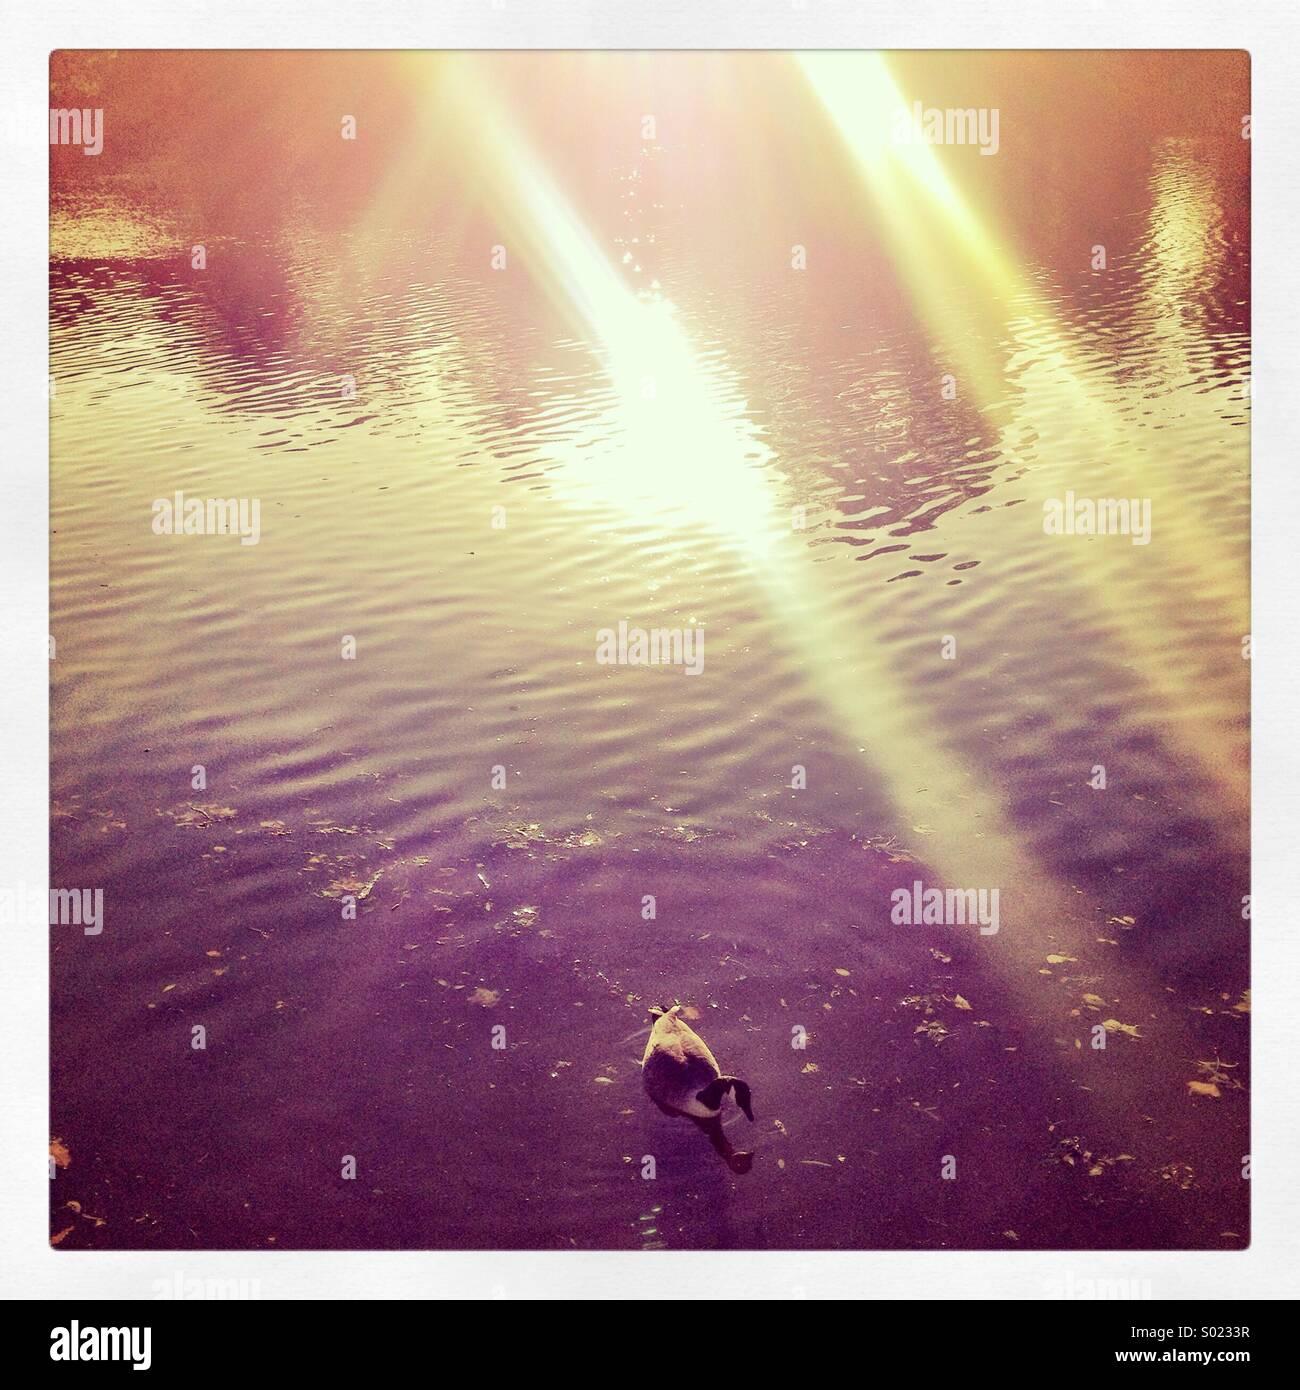 Gans in der Themse mit Blendenfleck Stockbild